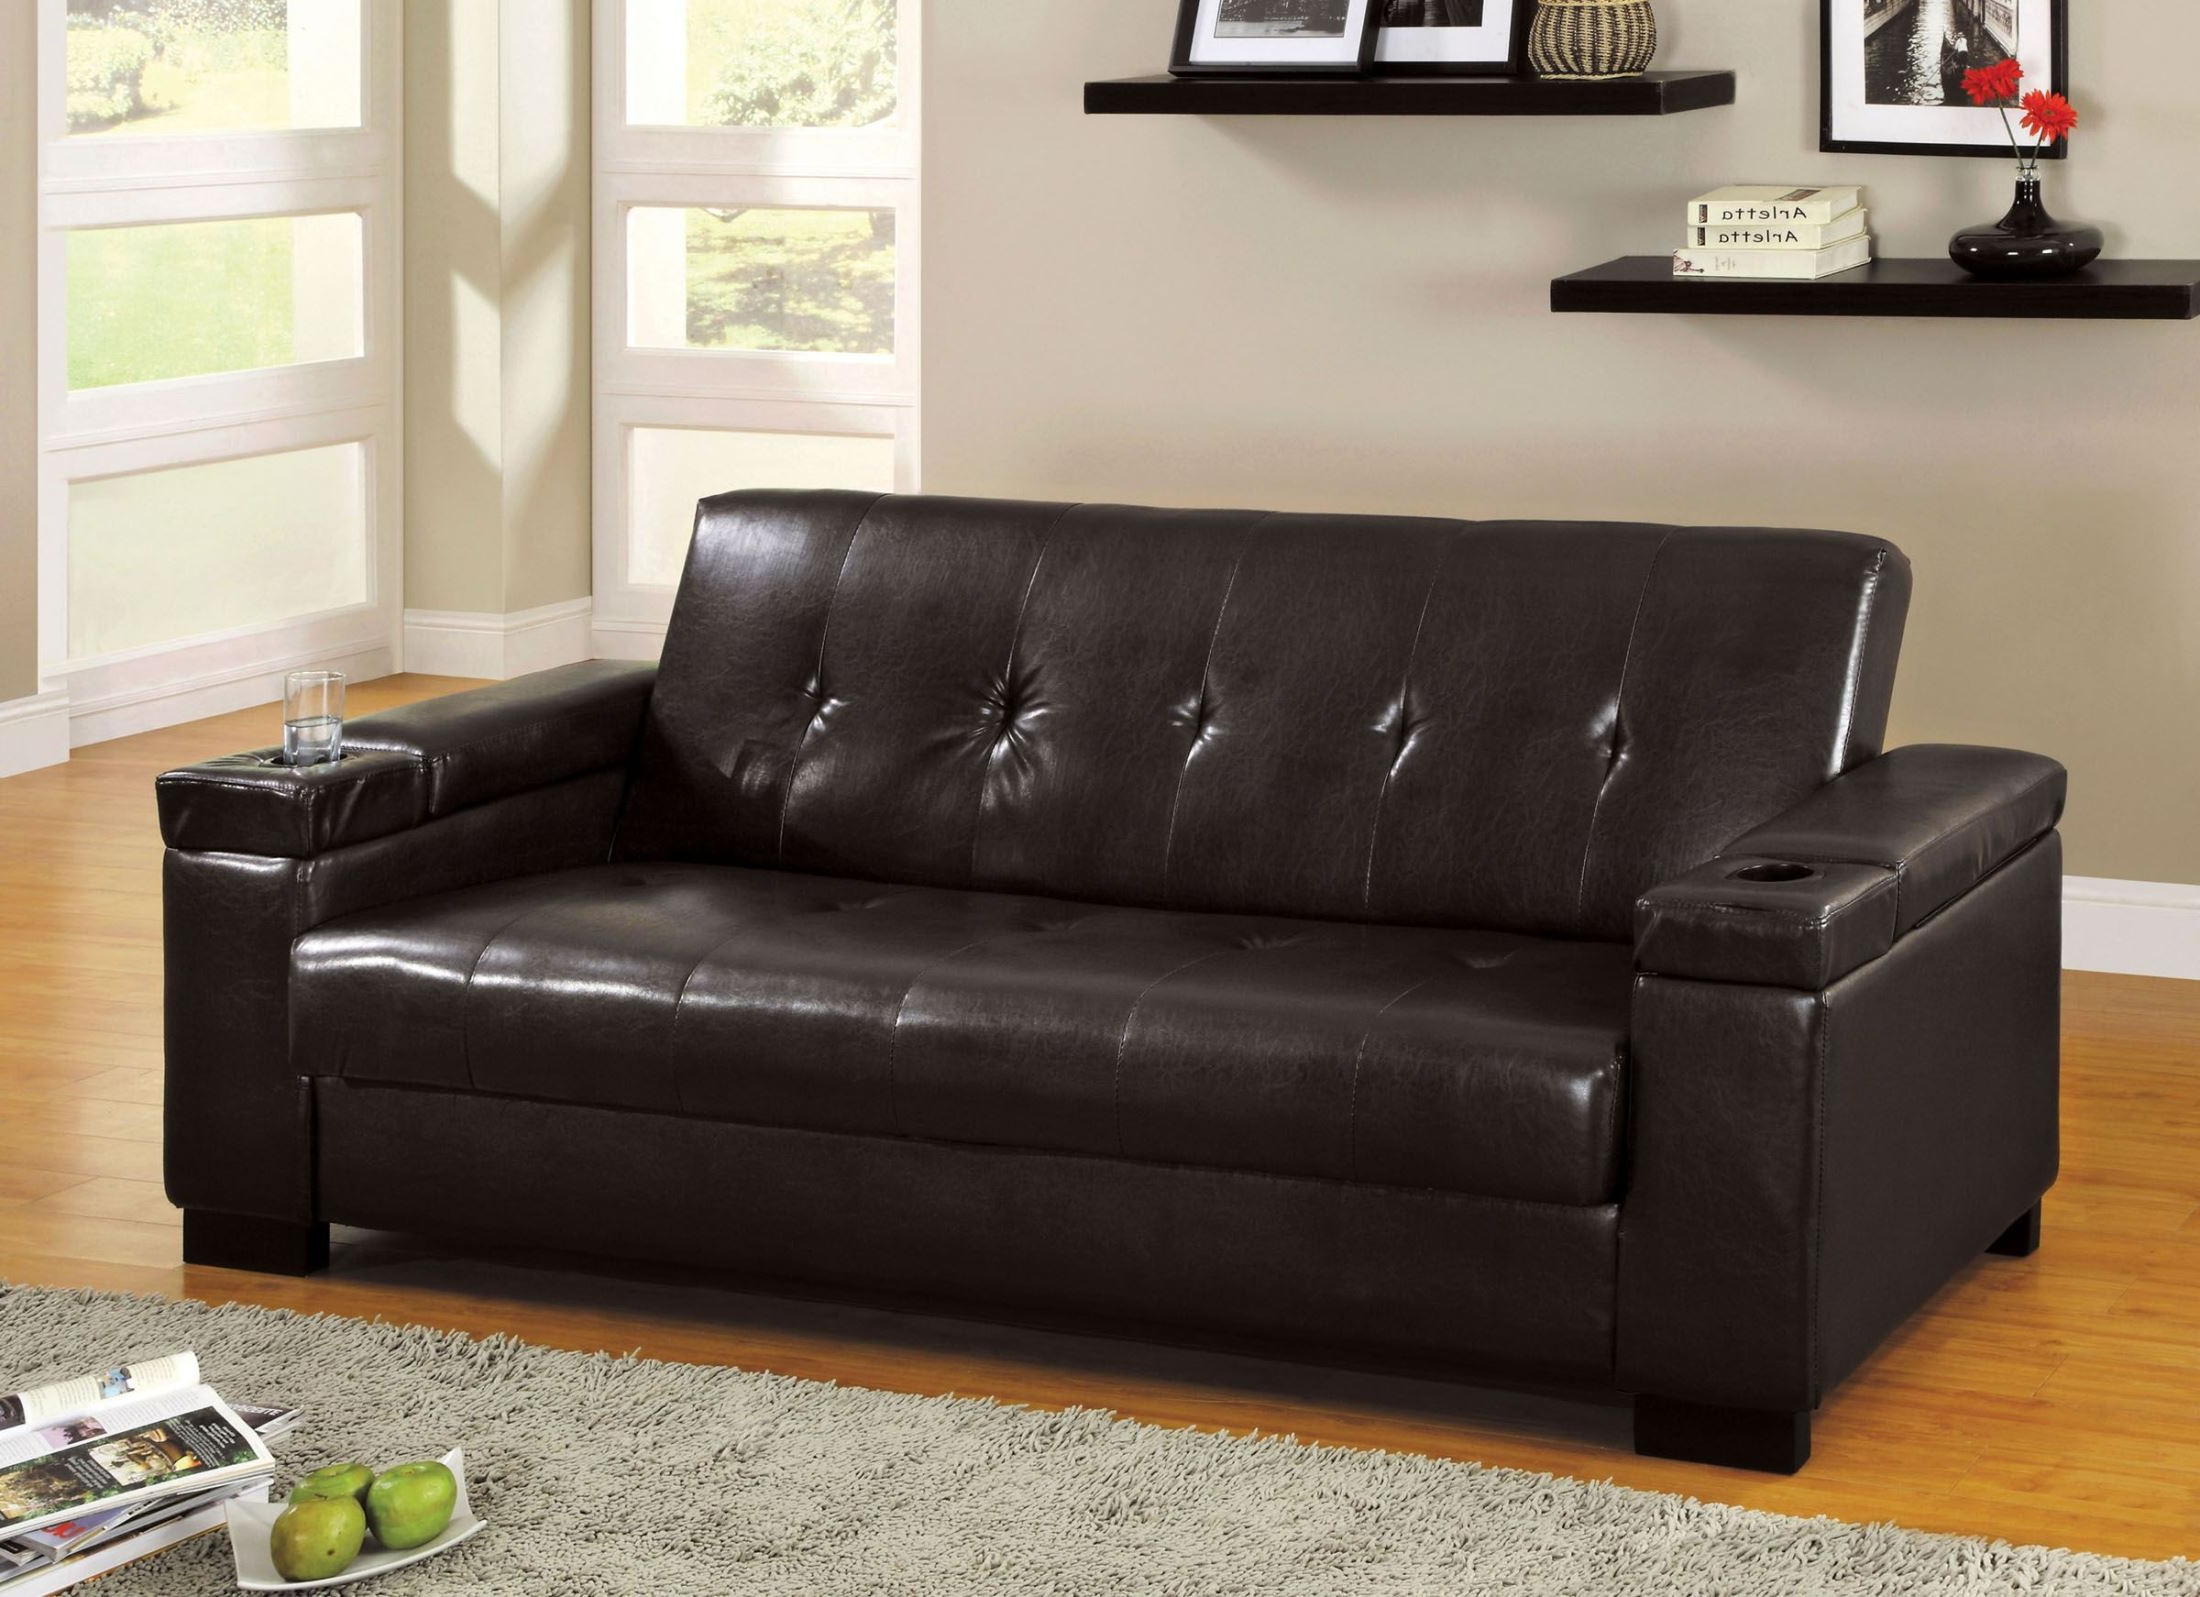 Logan Leatherette Futon Storage Sofa From Furniture Of Throughout Newest Hartford Storage Sectional Futon Sofas (View 3 of 20)